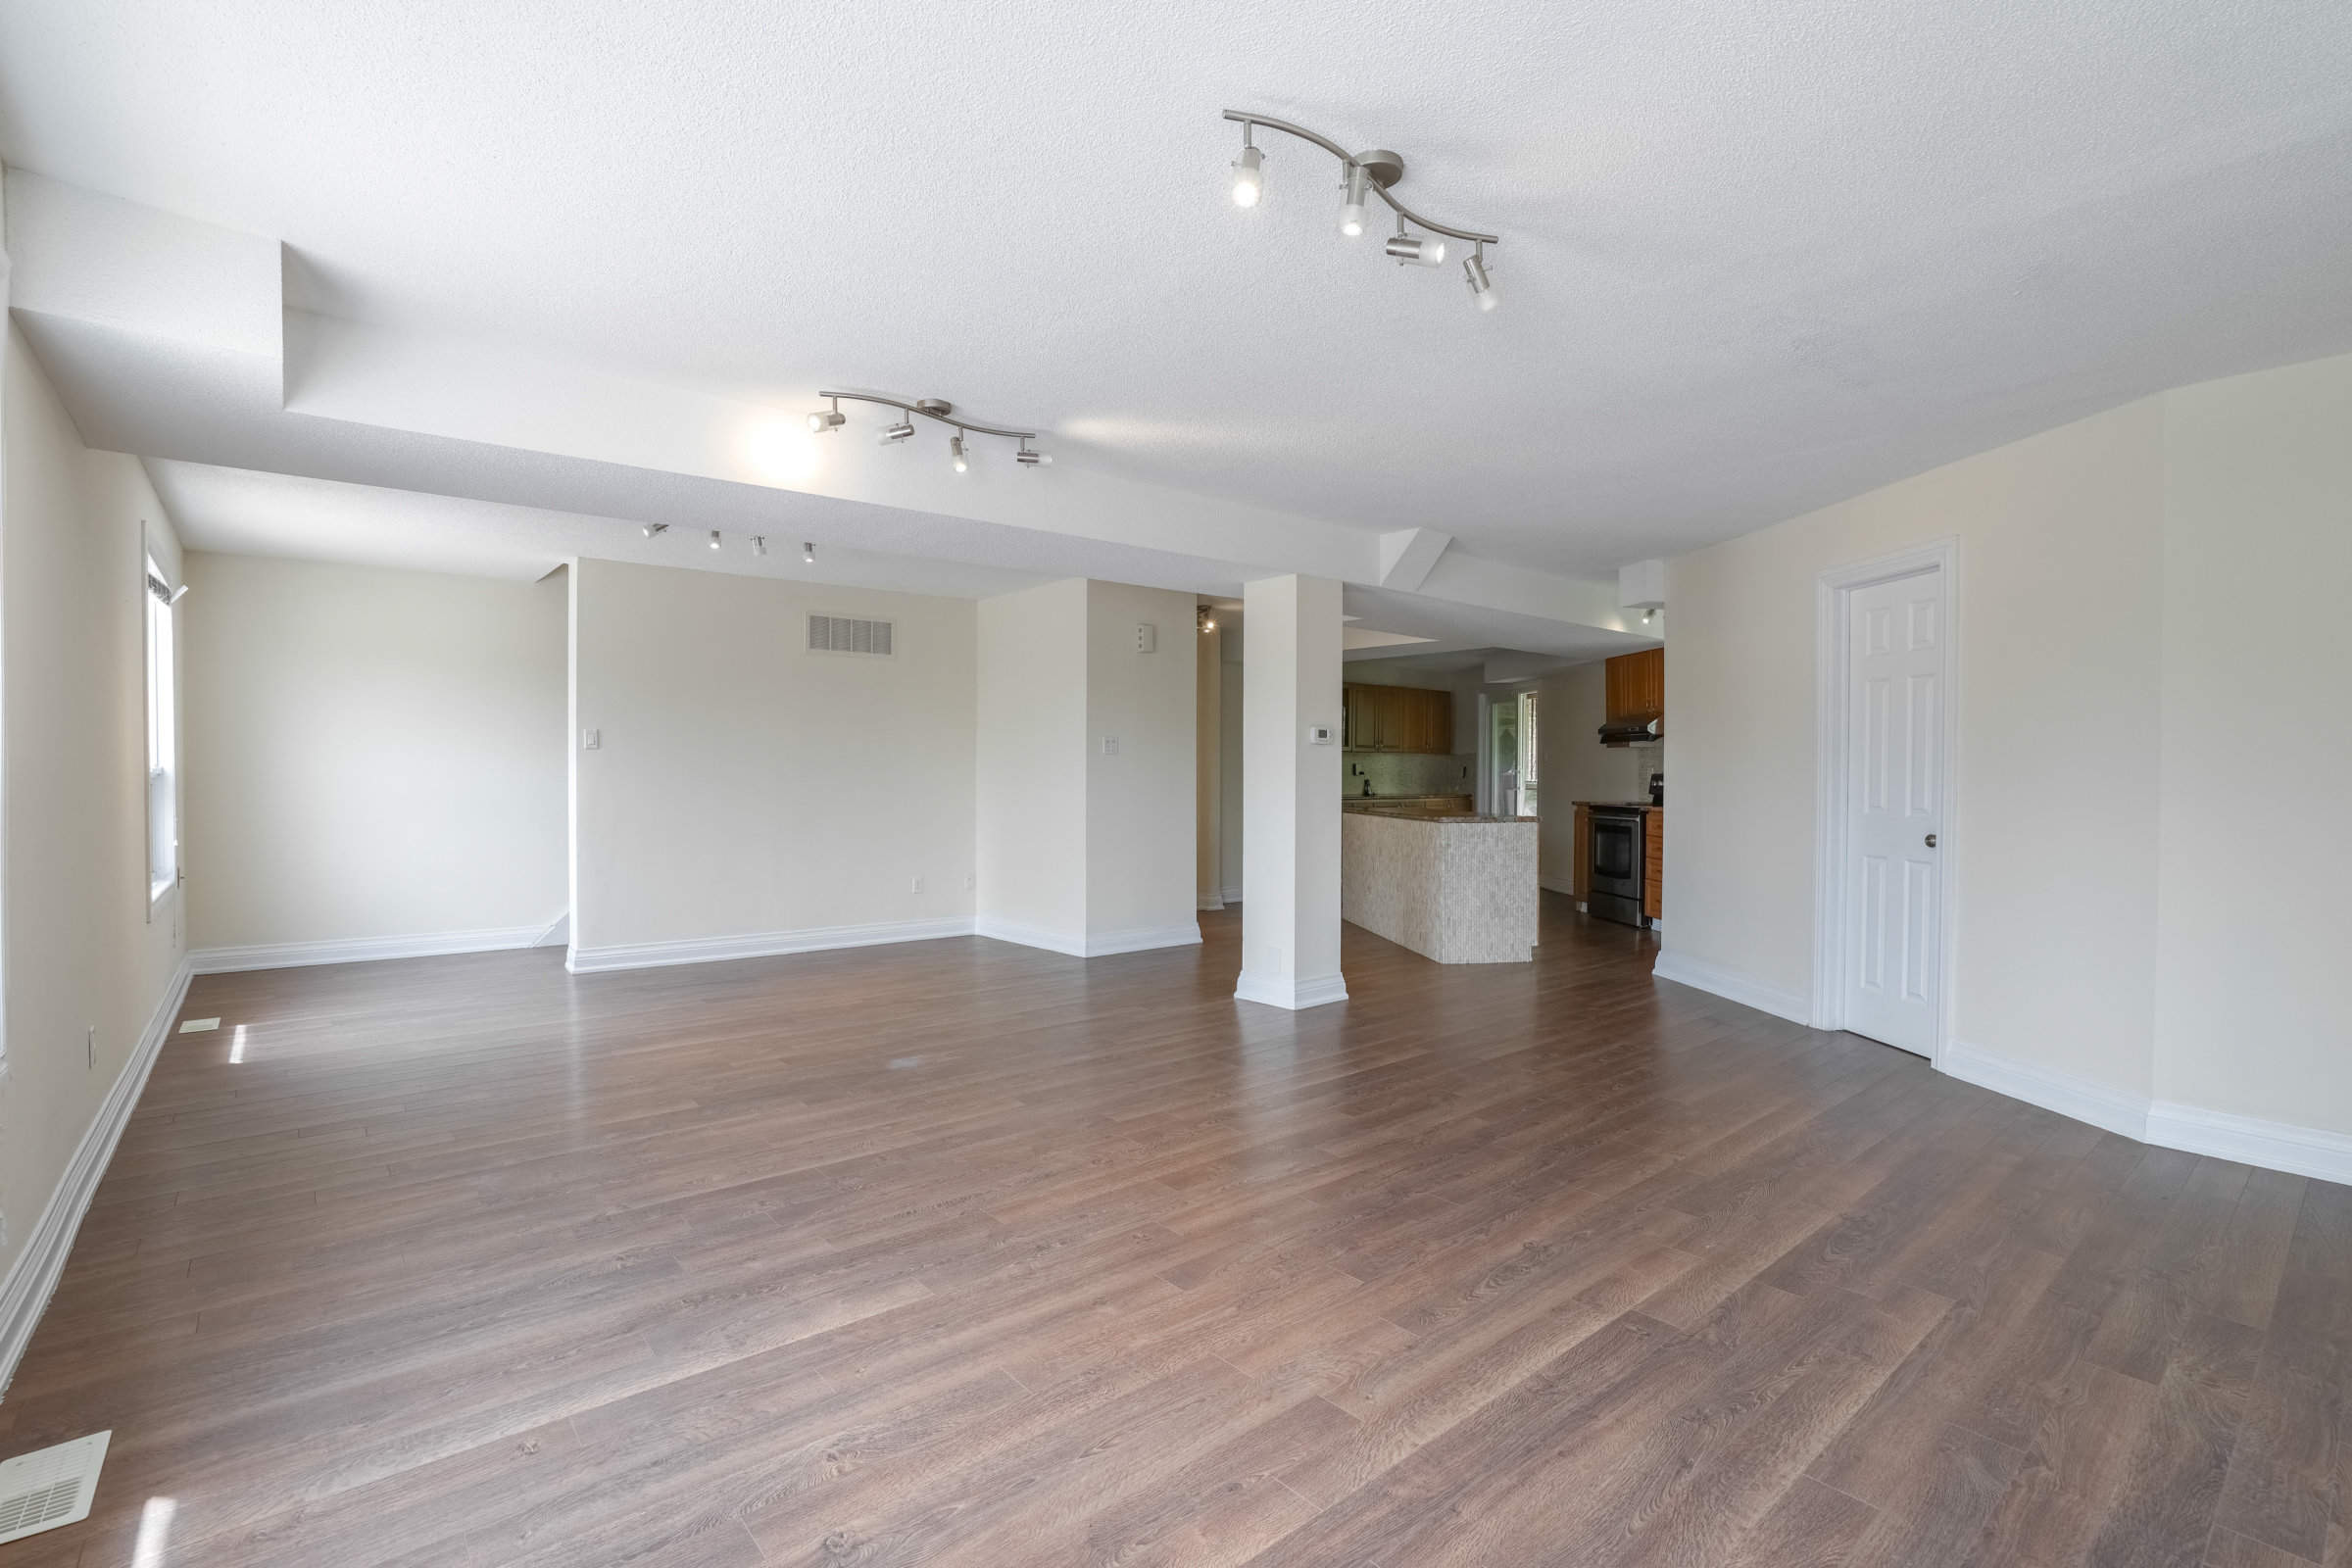 hardwood flooring dundas of 4130 dundas street west etobicoke by margarita celuch regarding 533758